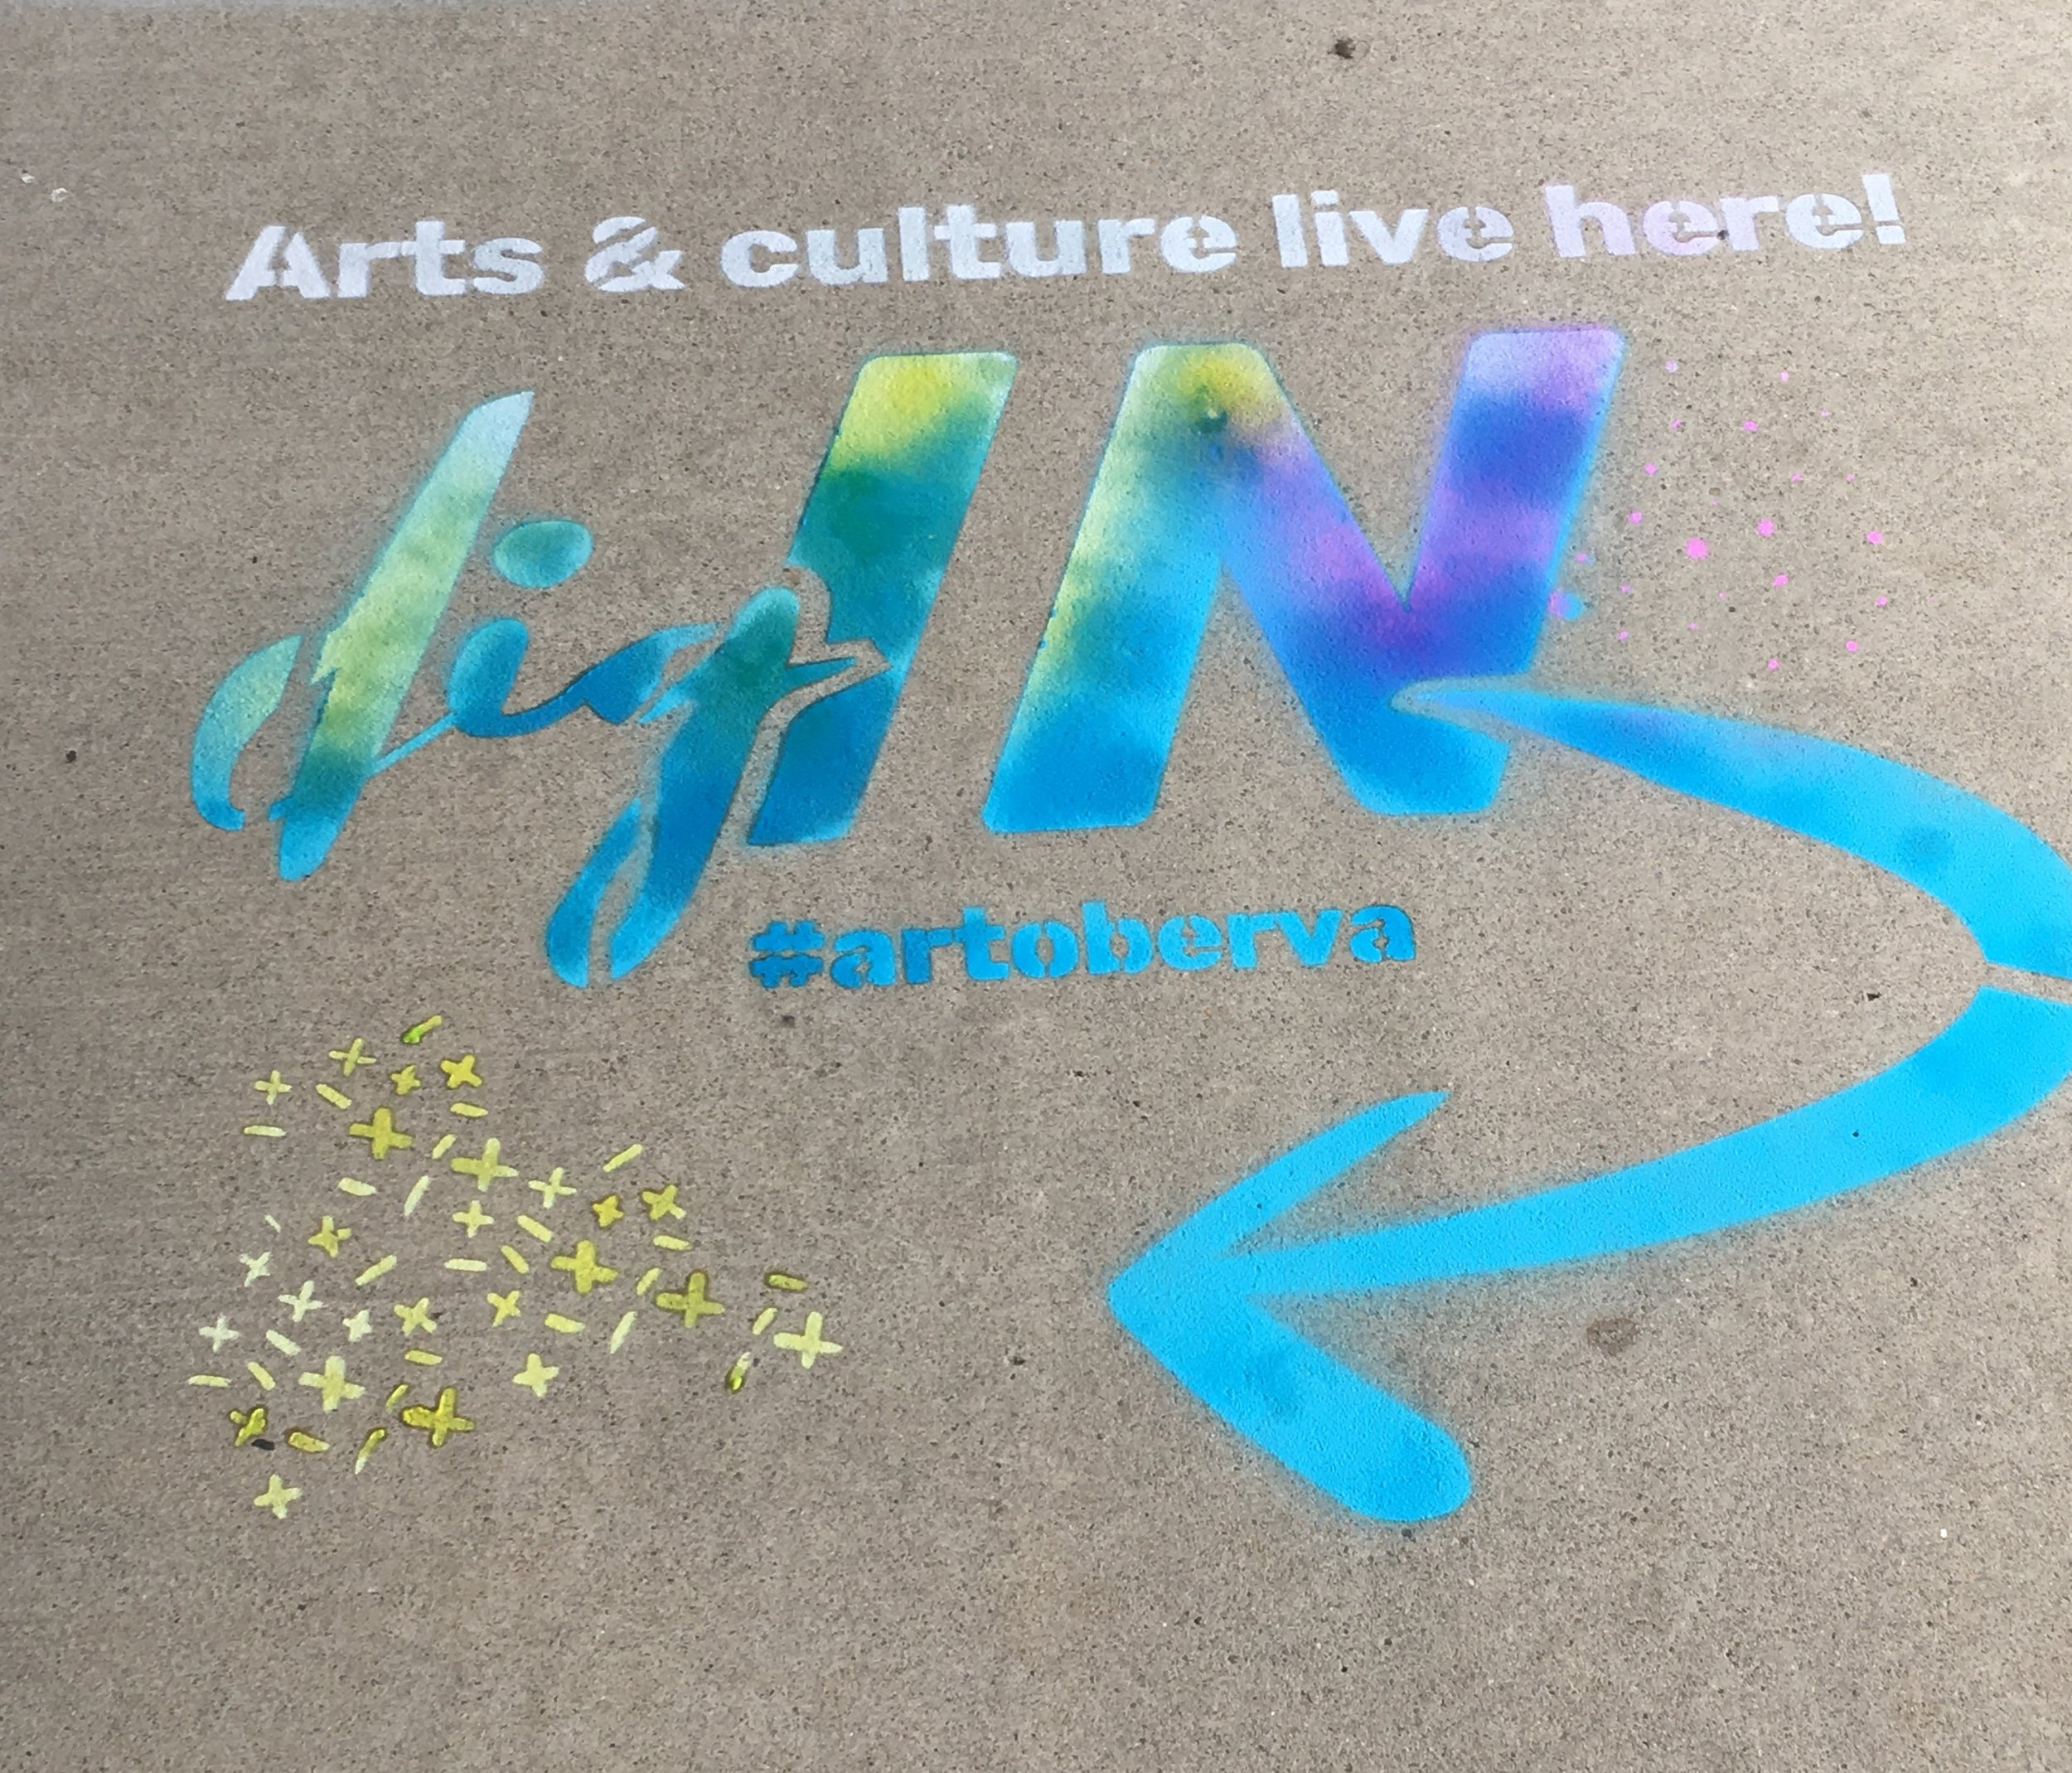 #artoberva marketing strategy consulting firm